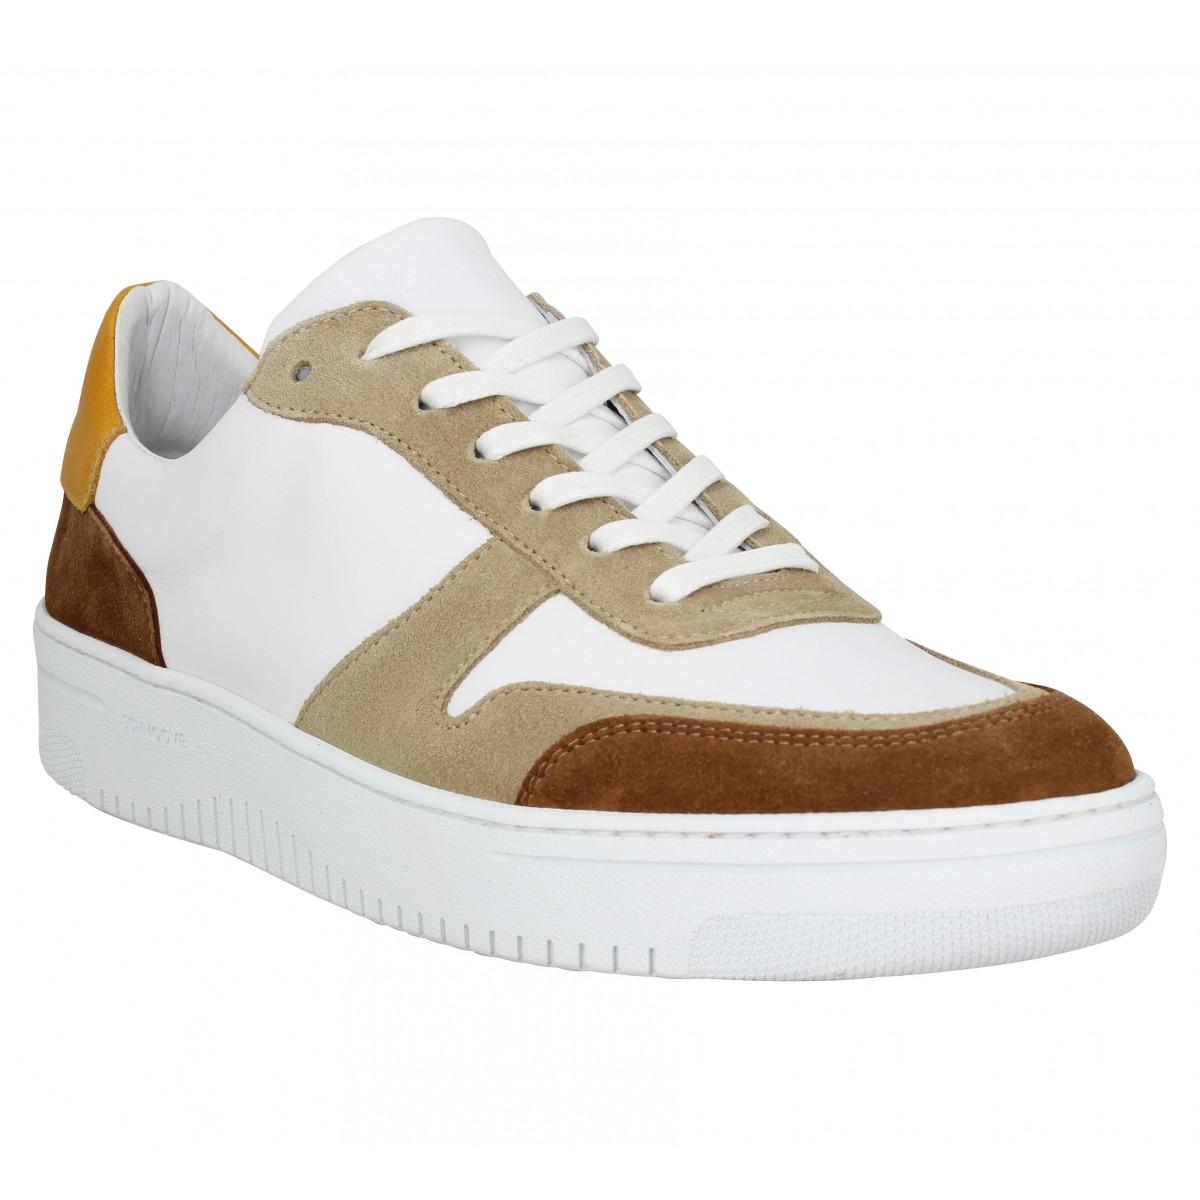 Baskets SCHMOOVE Evoc Sneaker cuir velours Homme Blanc Tan